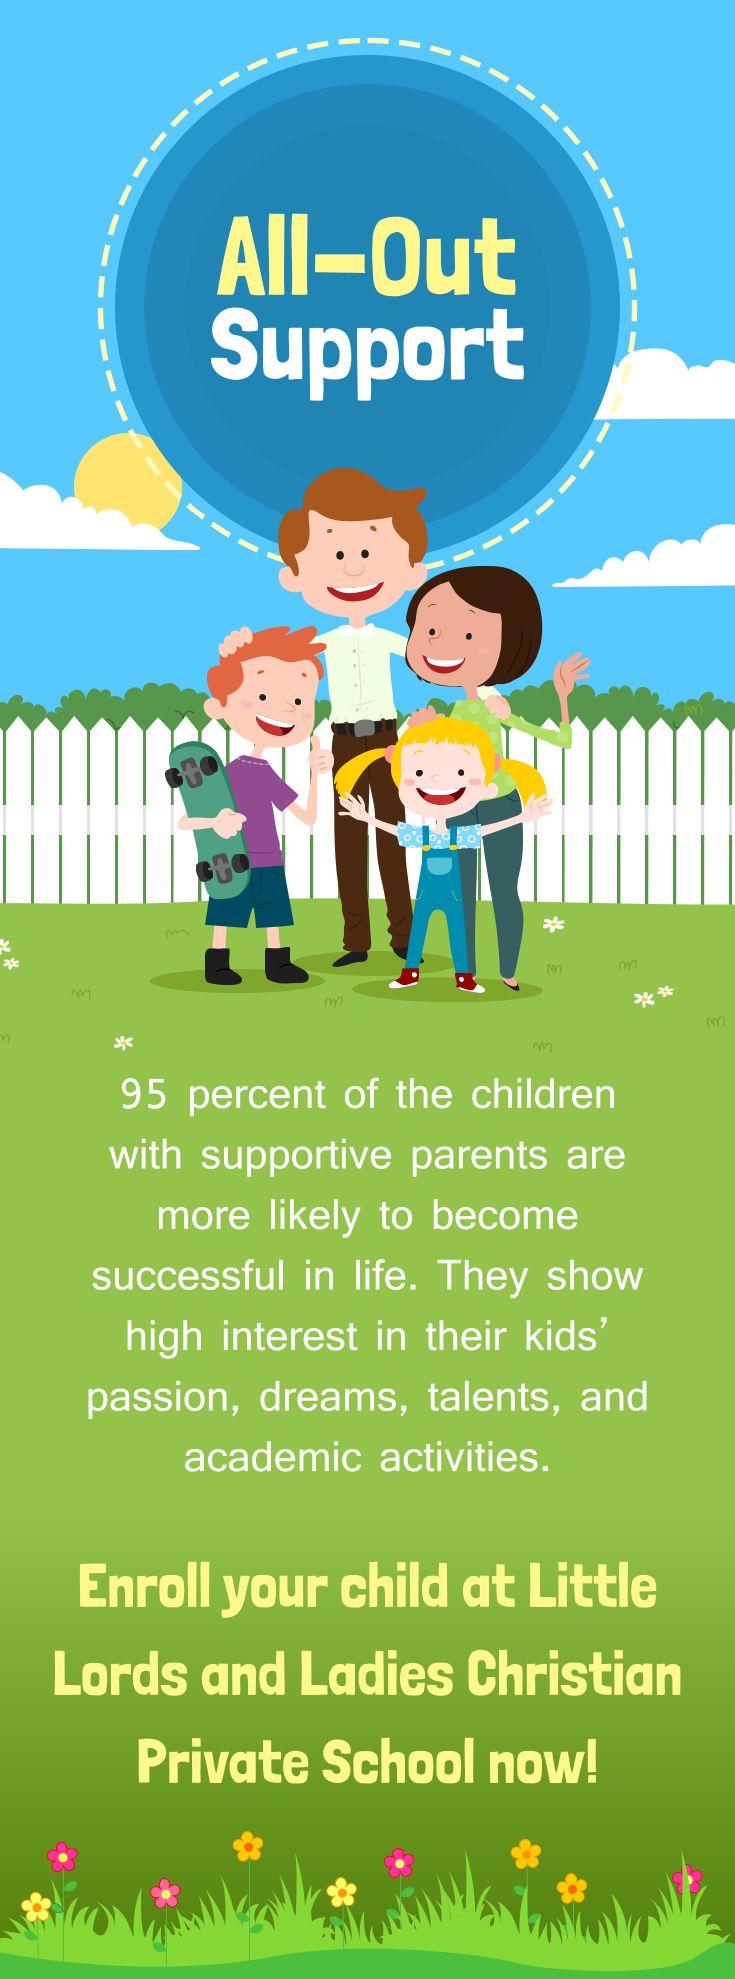 All-Out Support #support  #preschool #parents   www.littlelordsandladiescps.com